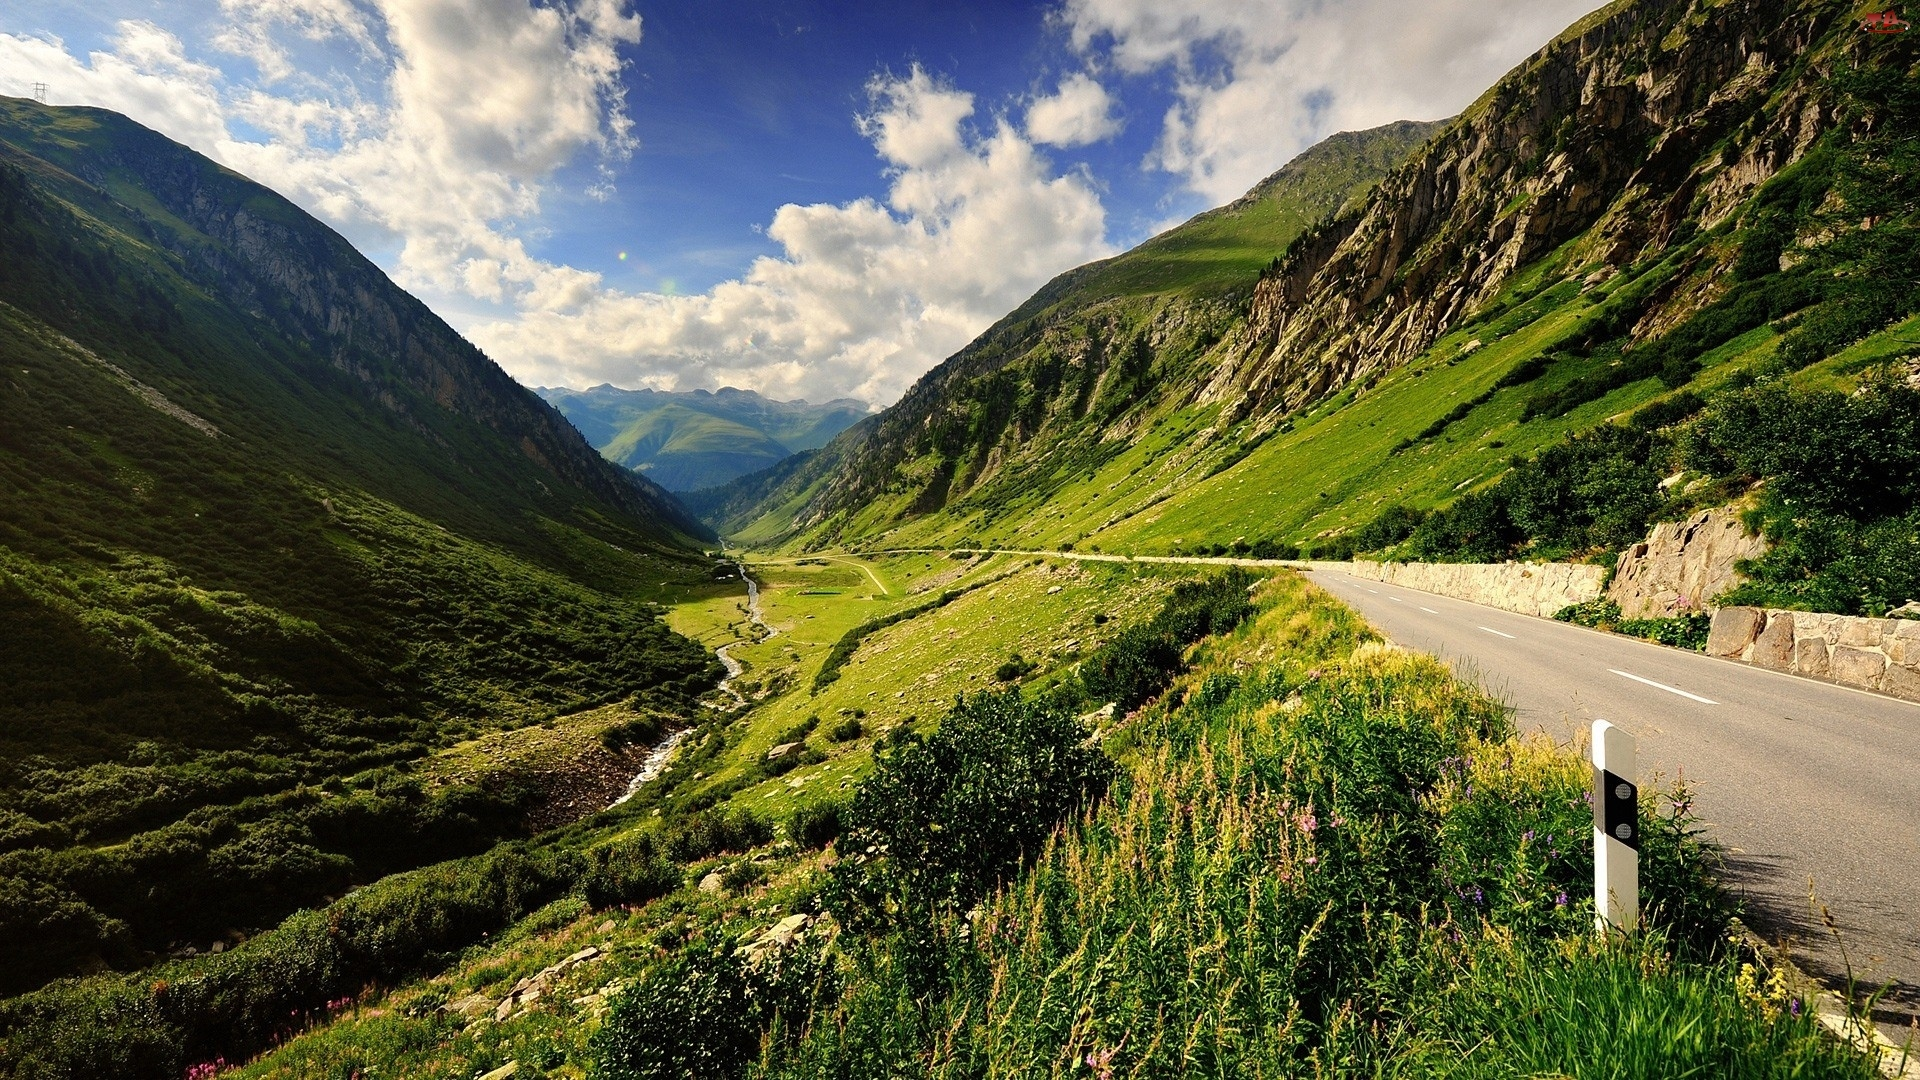 Góry, Trawa, Droga, Chmury